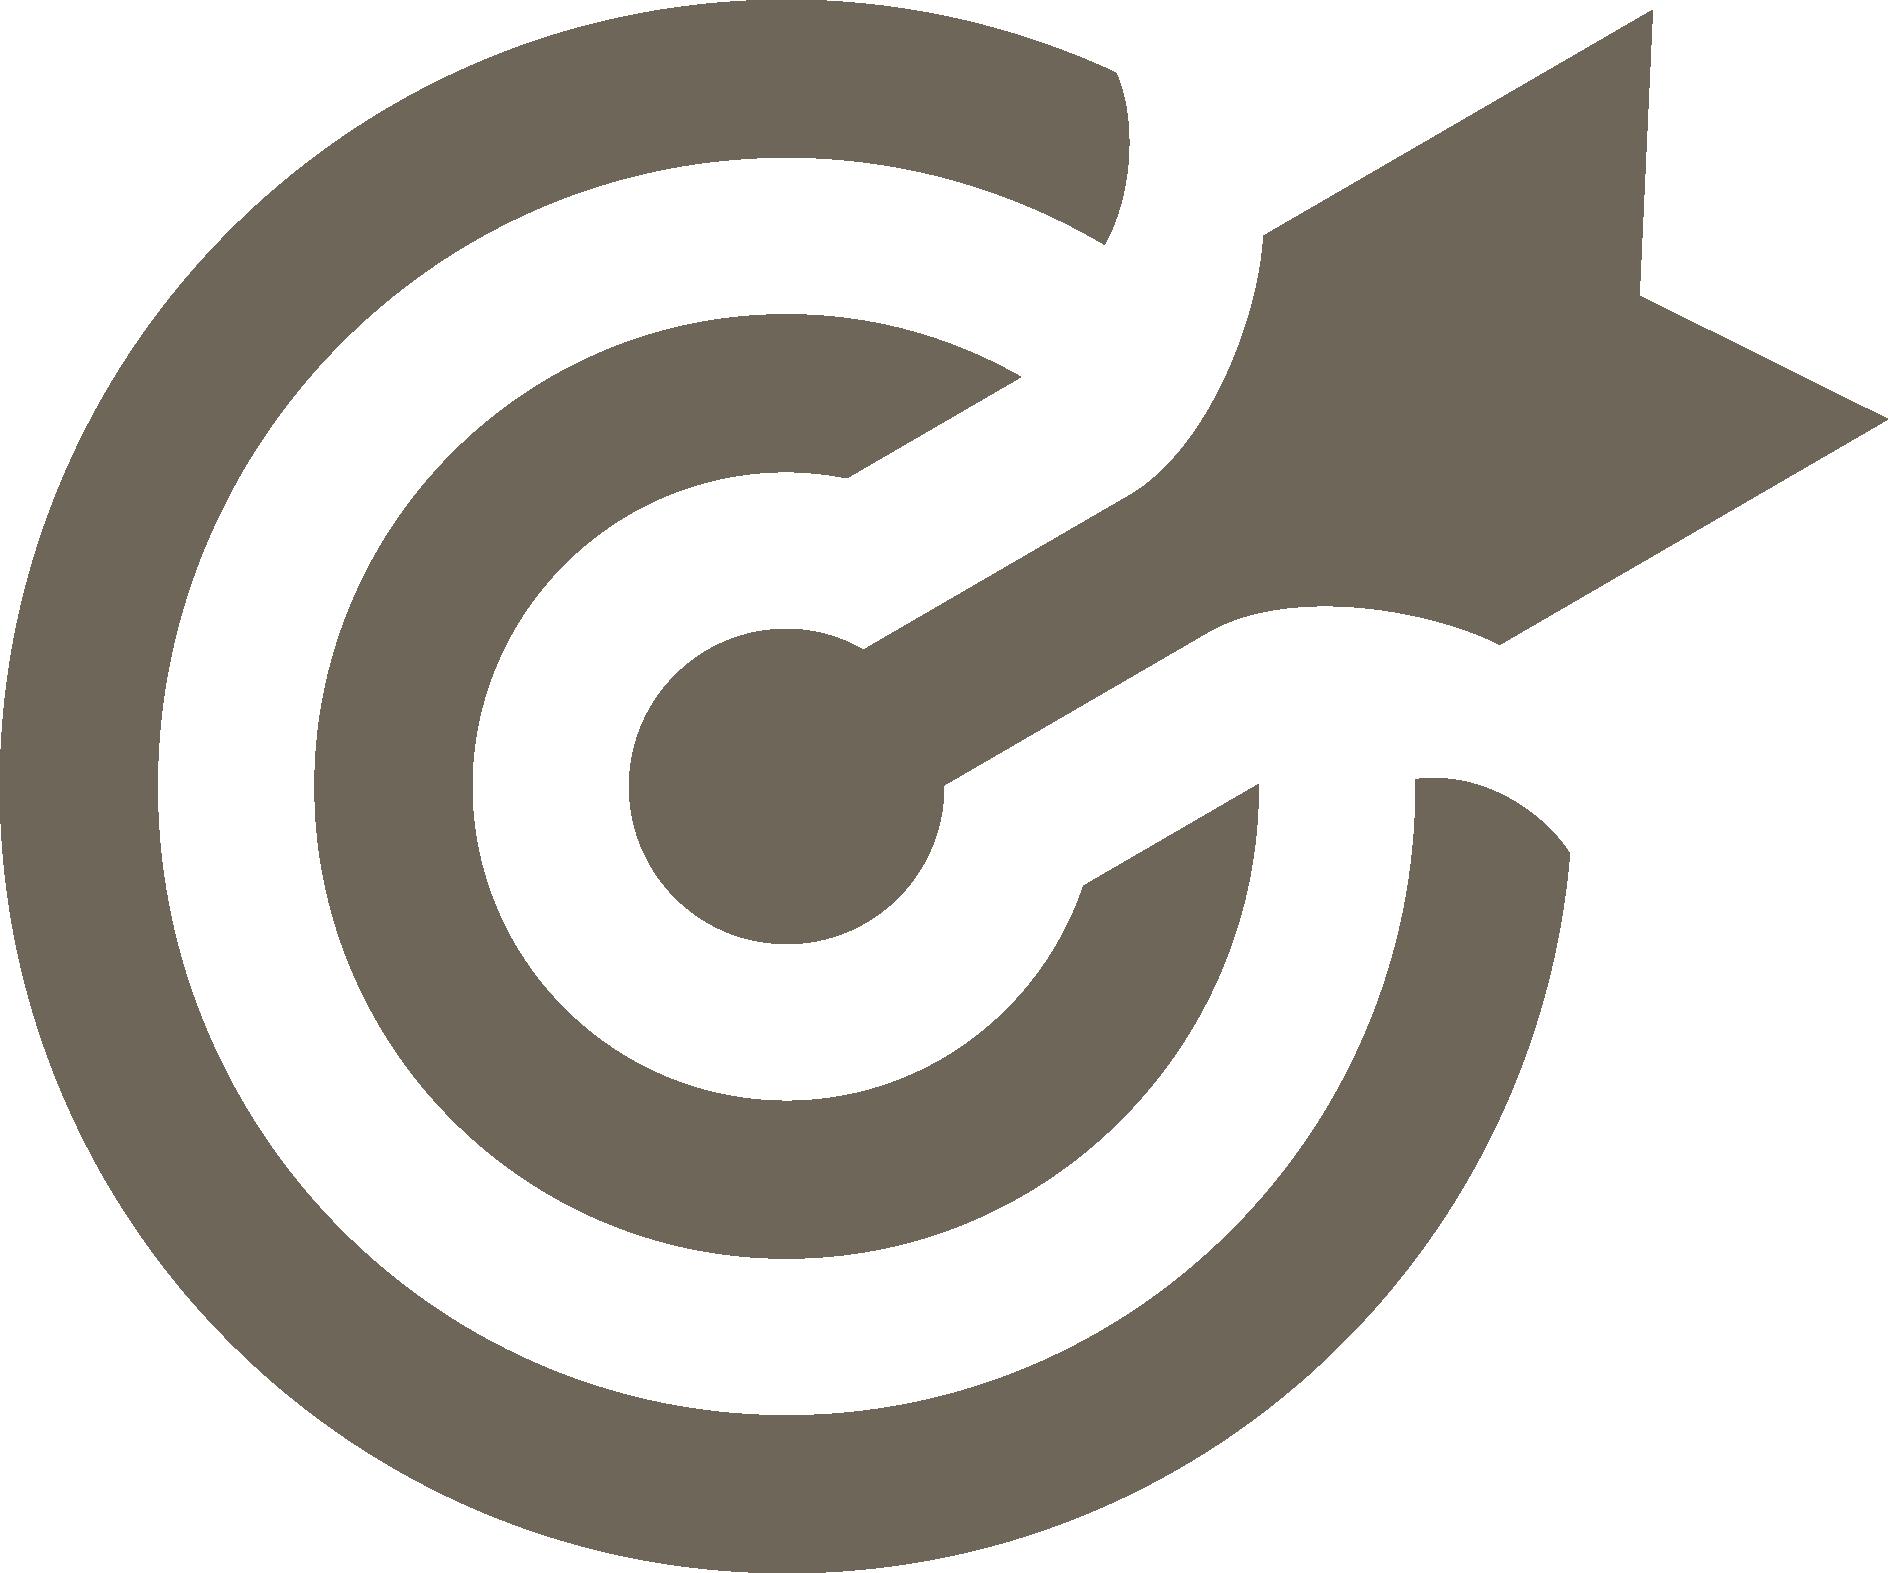 Kernwerte icoon